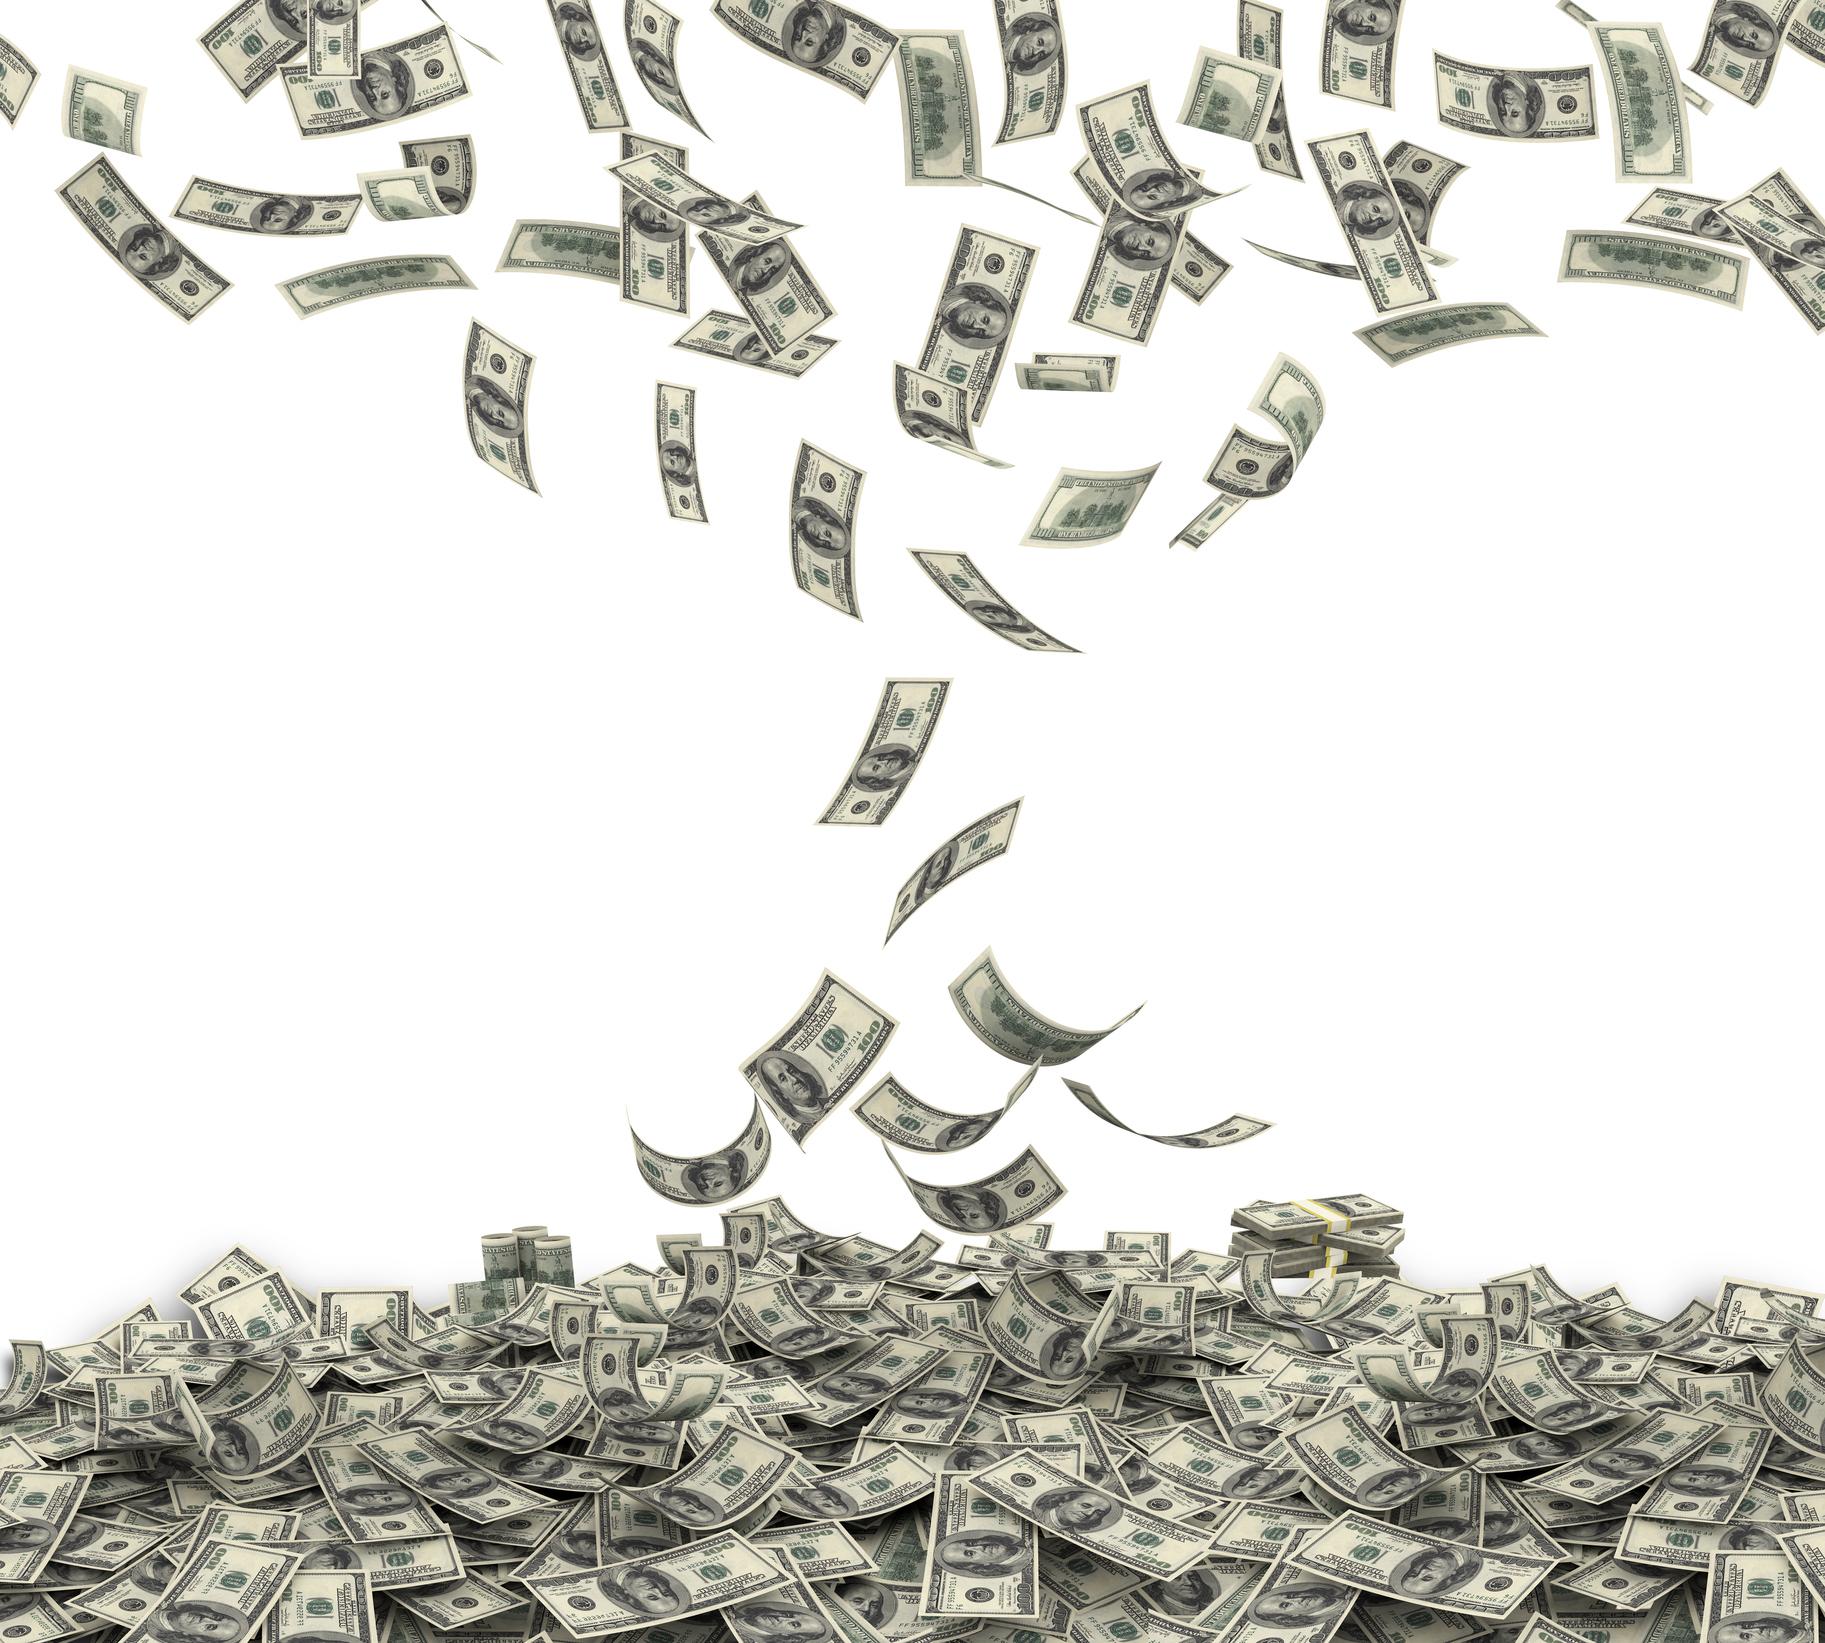 Money falling into large pile